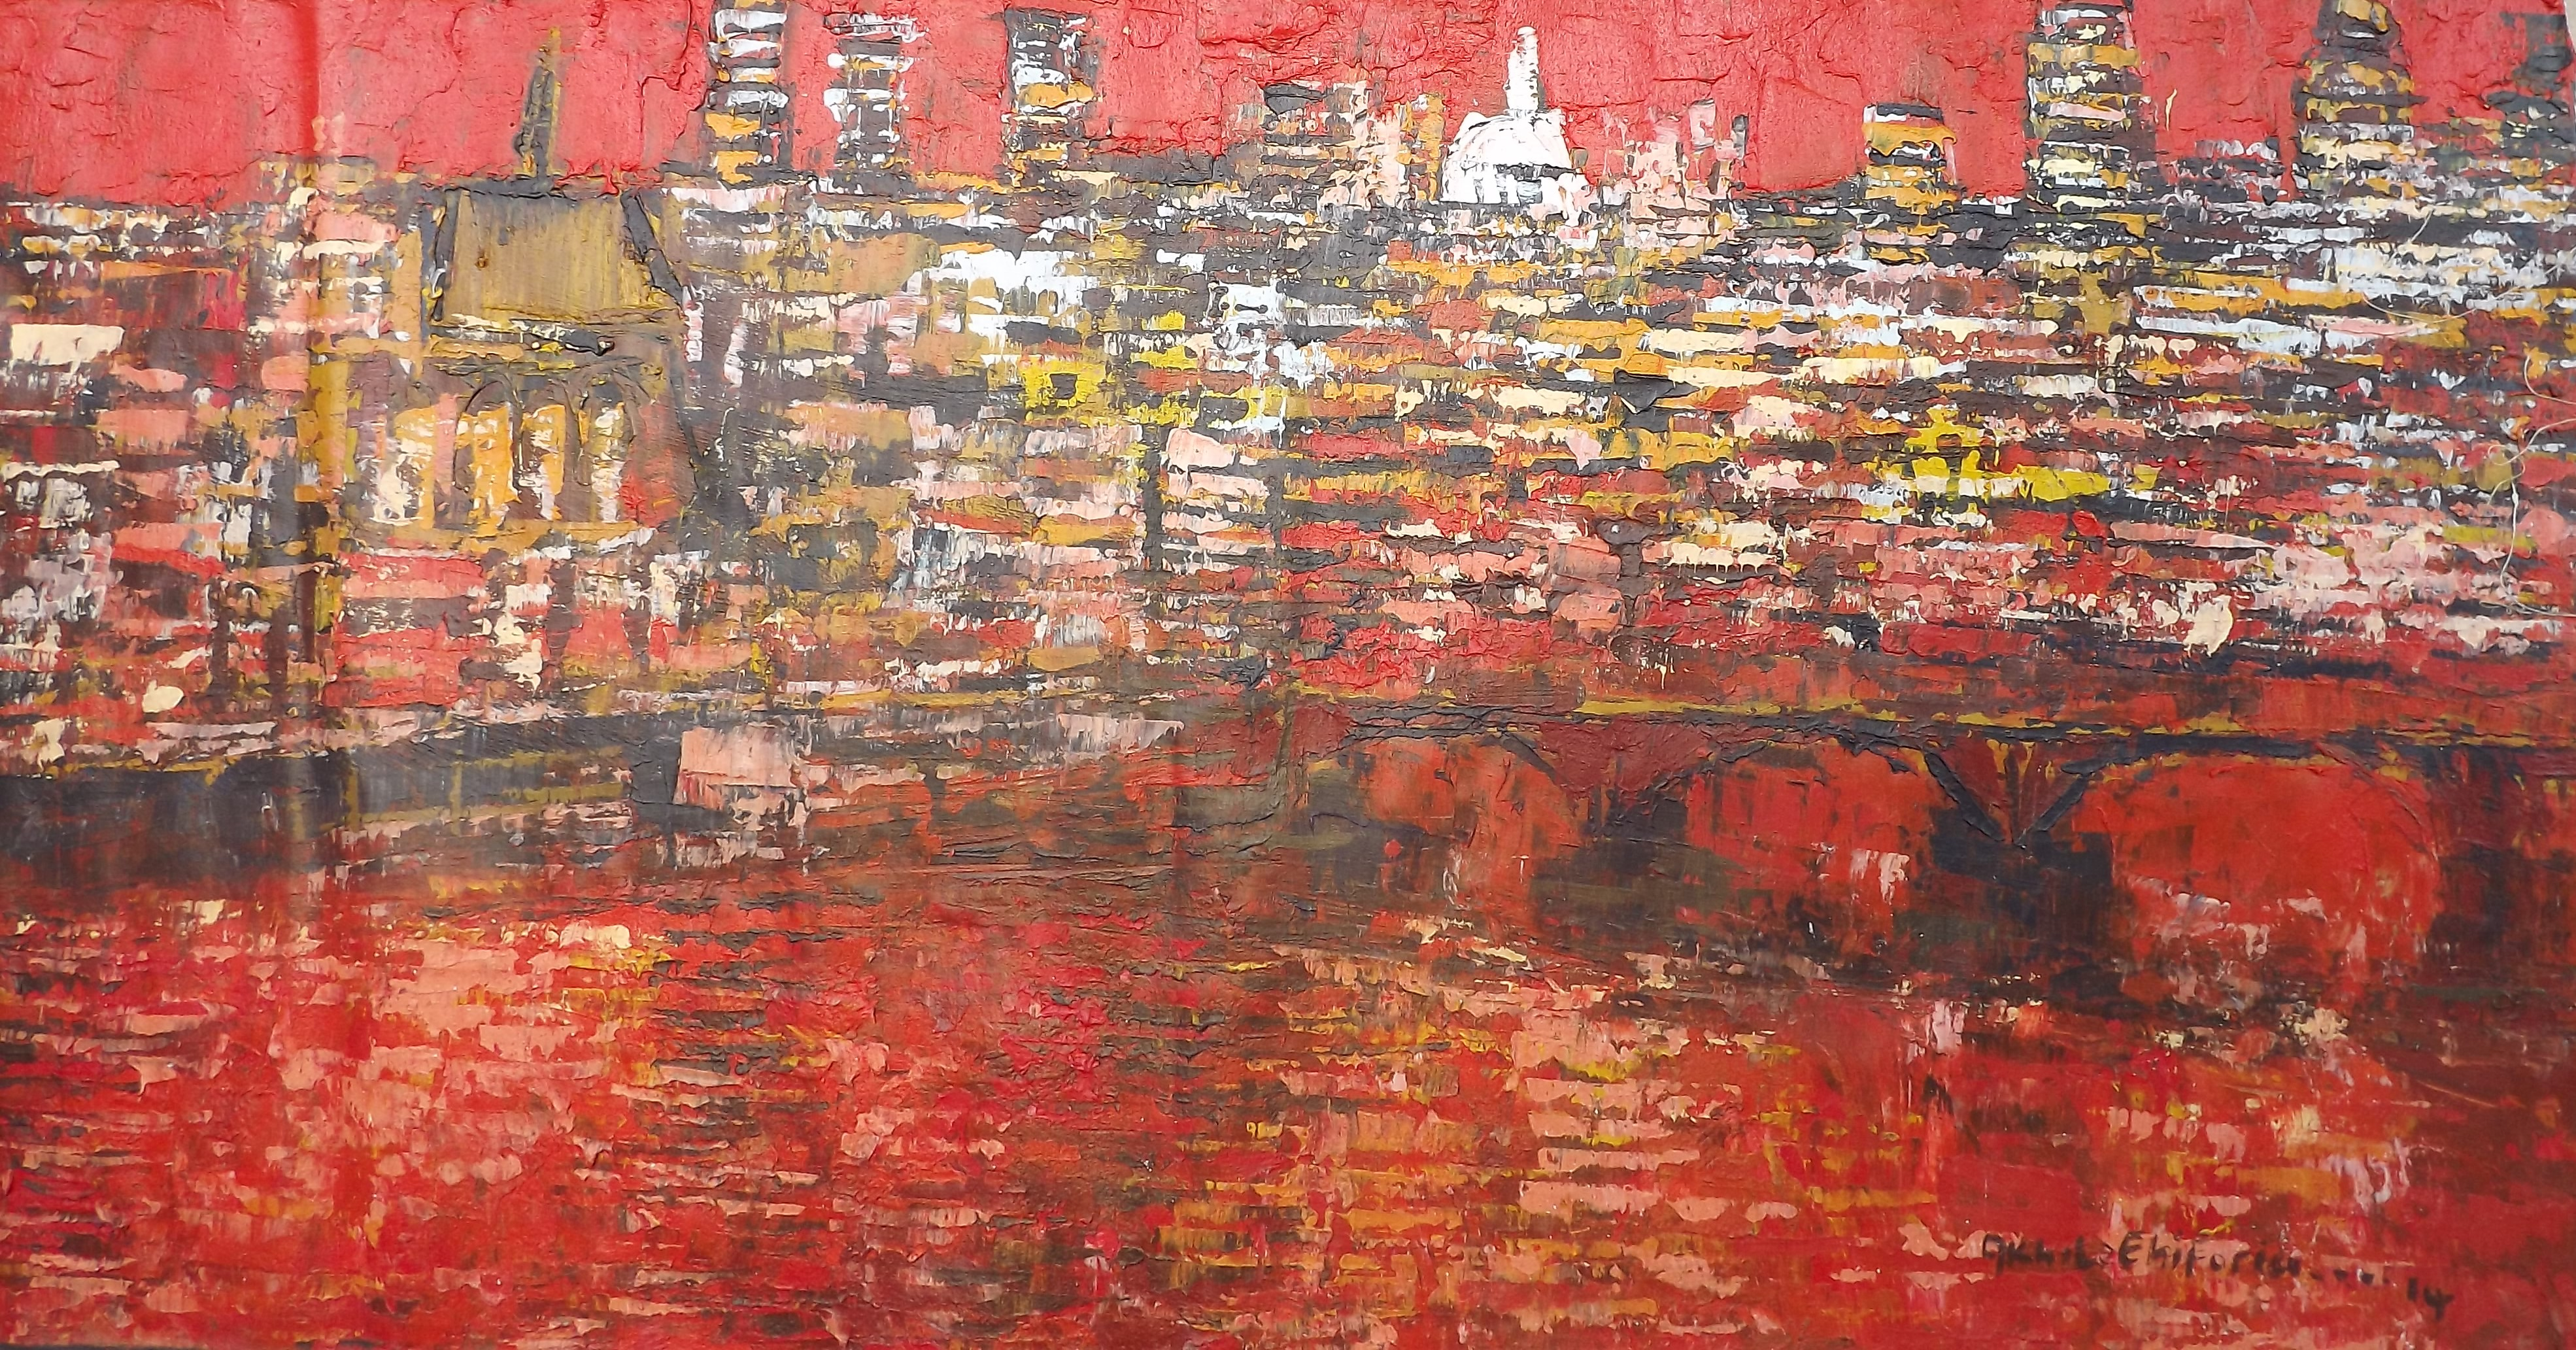 Acrylic on canvas - 49 x 24 in